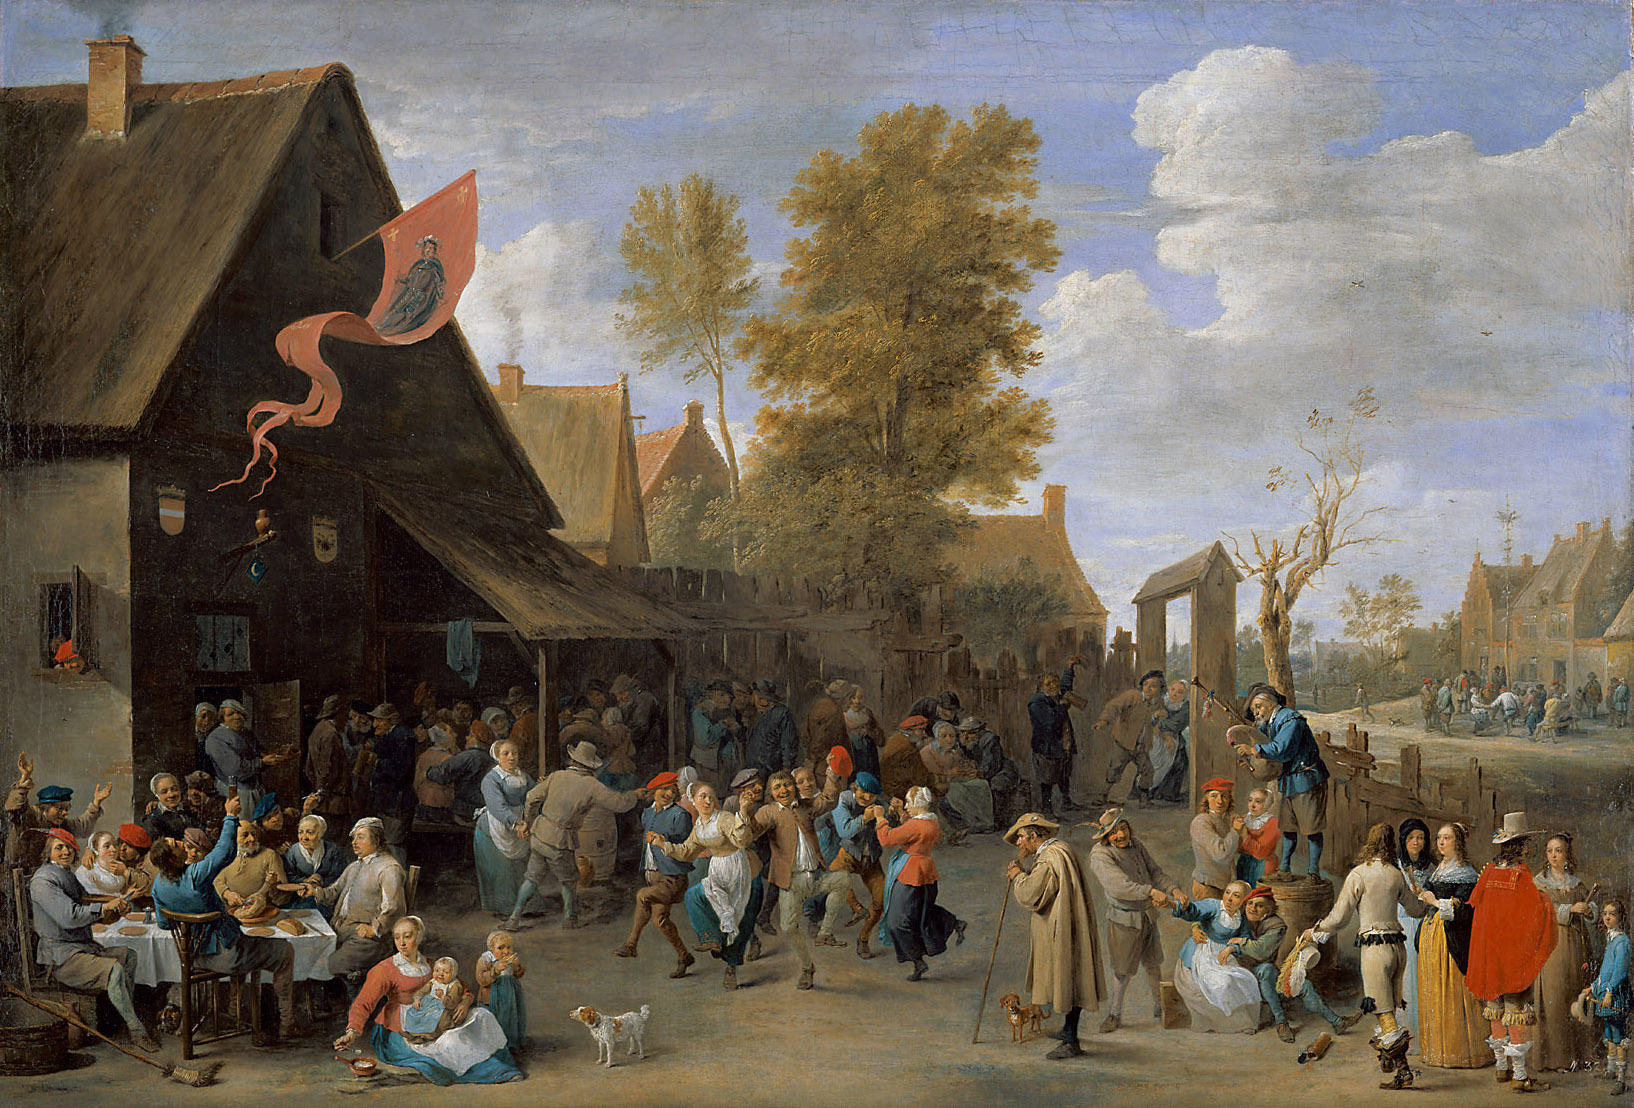 Картинки по запросу давид тенирс младший крестьянский базар